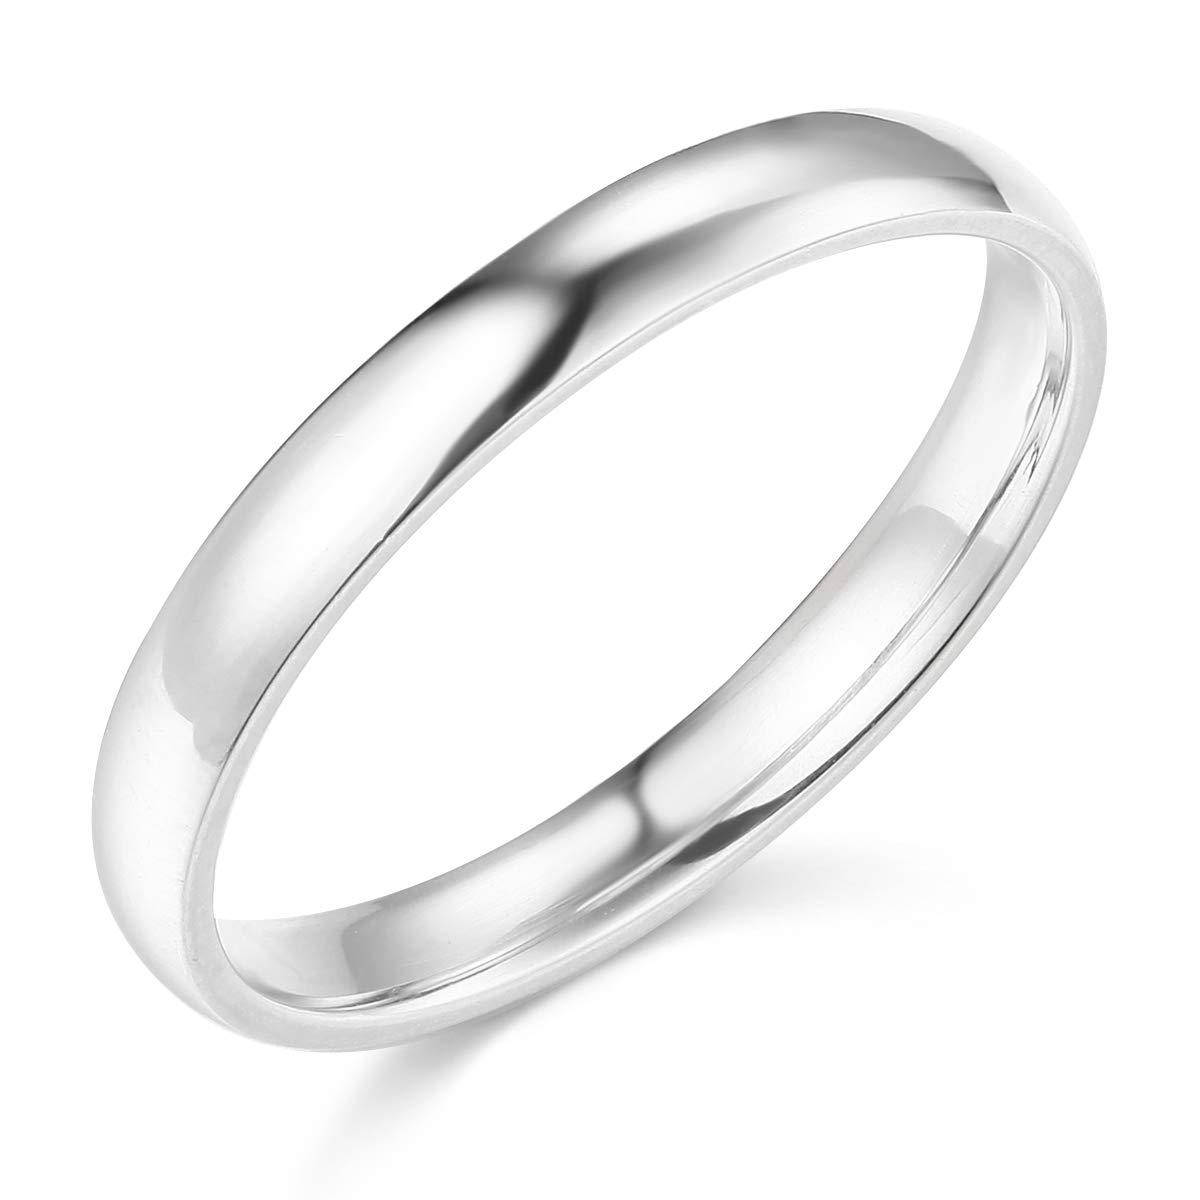 ihuoshang Dangle Body Piercing Navel Belly Button Ring Bar Women Dance Ring,Steel 1